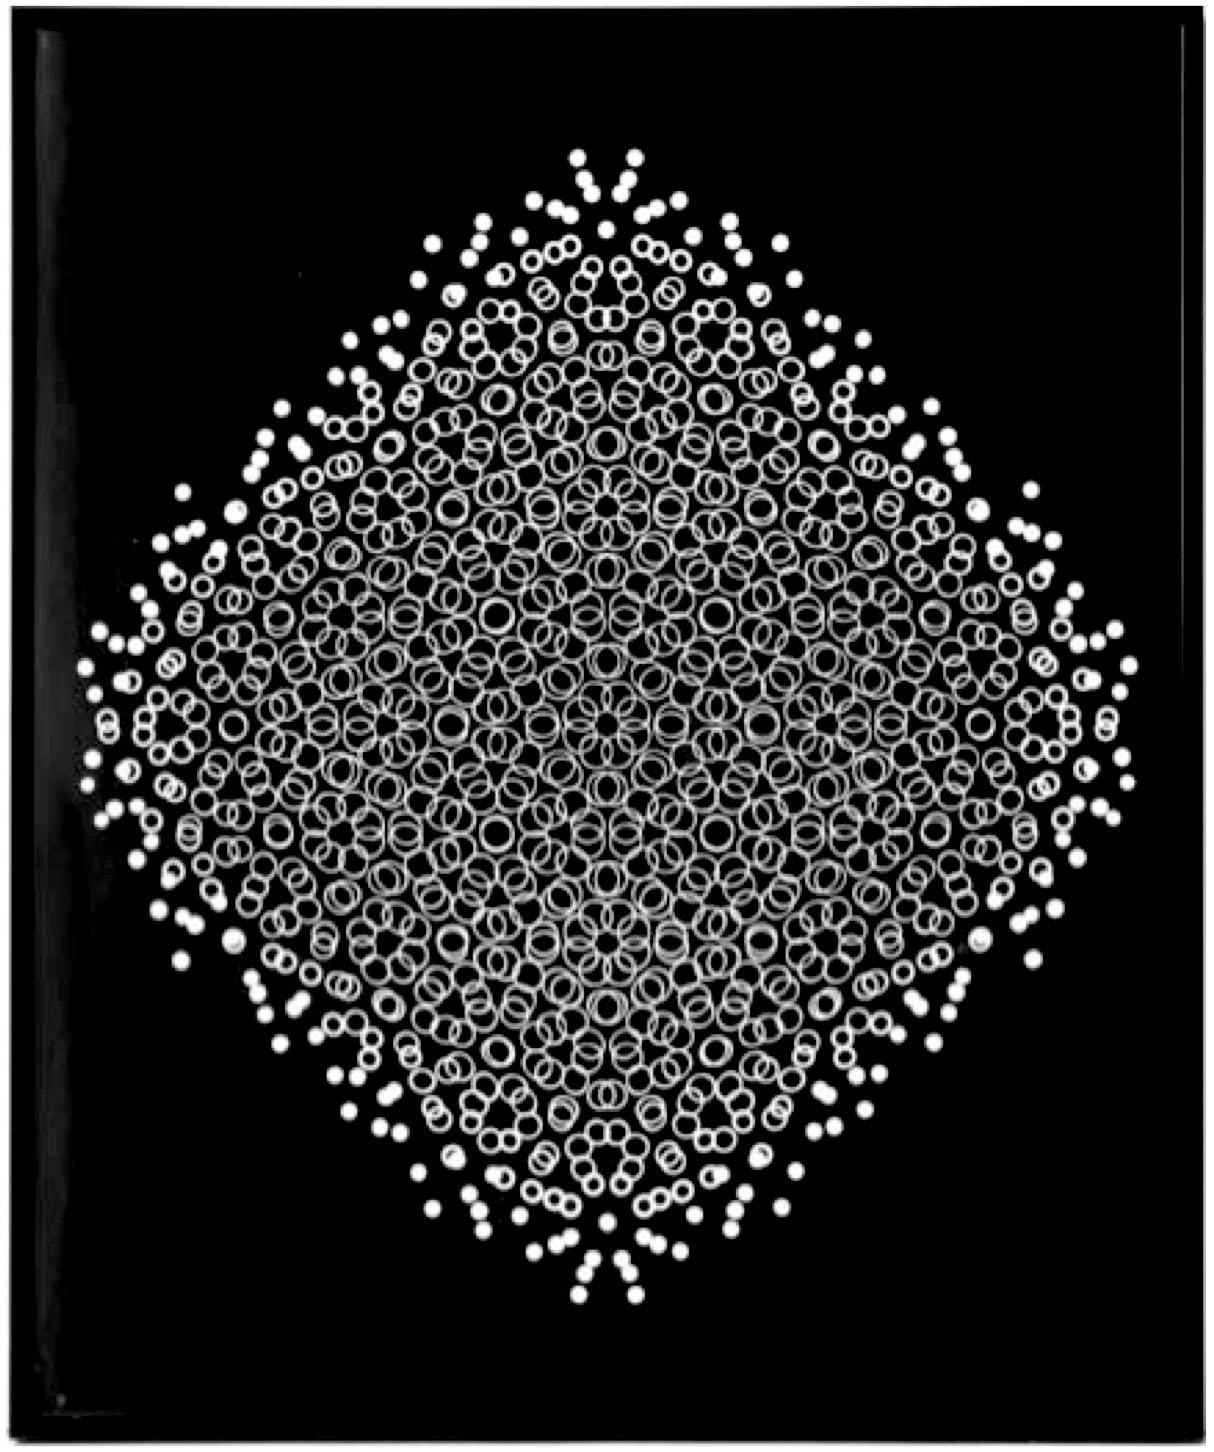 Jäger-Pinhole structure 3.8.14D4II.jpg